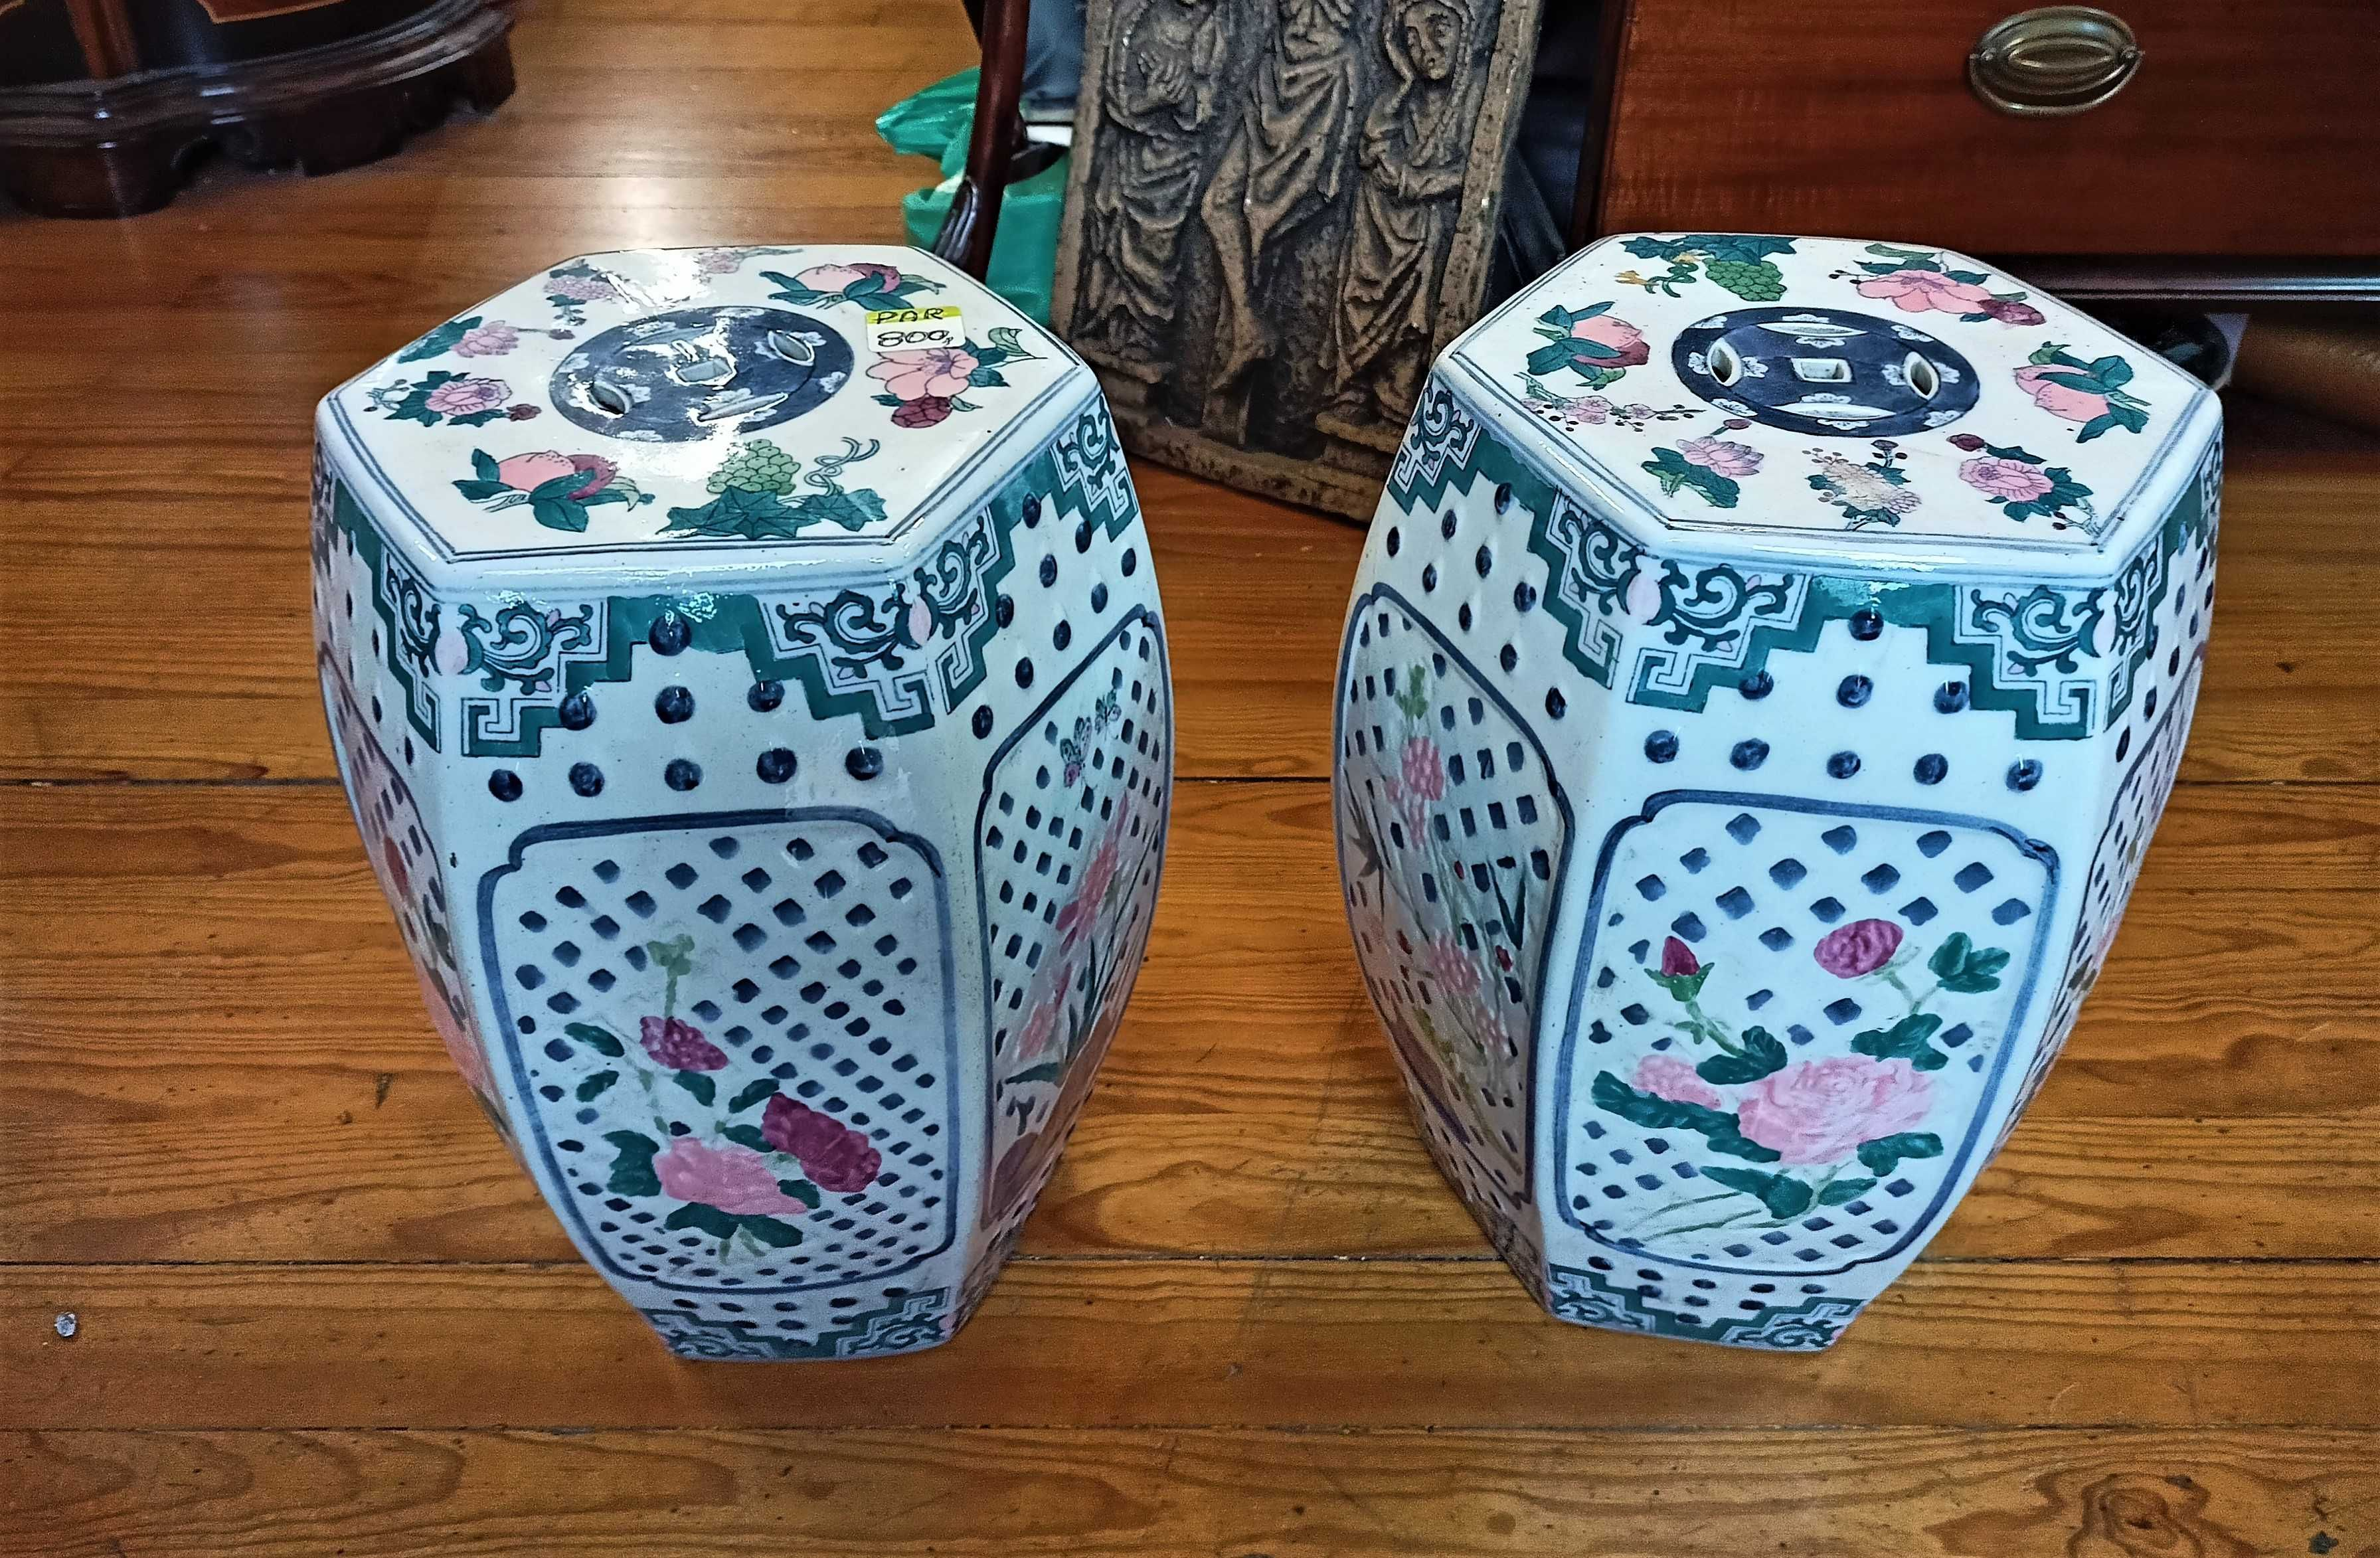 Par Bancos Jardim Cerâmica Chinese